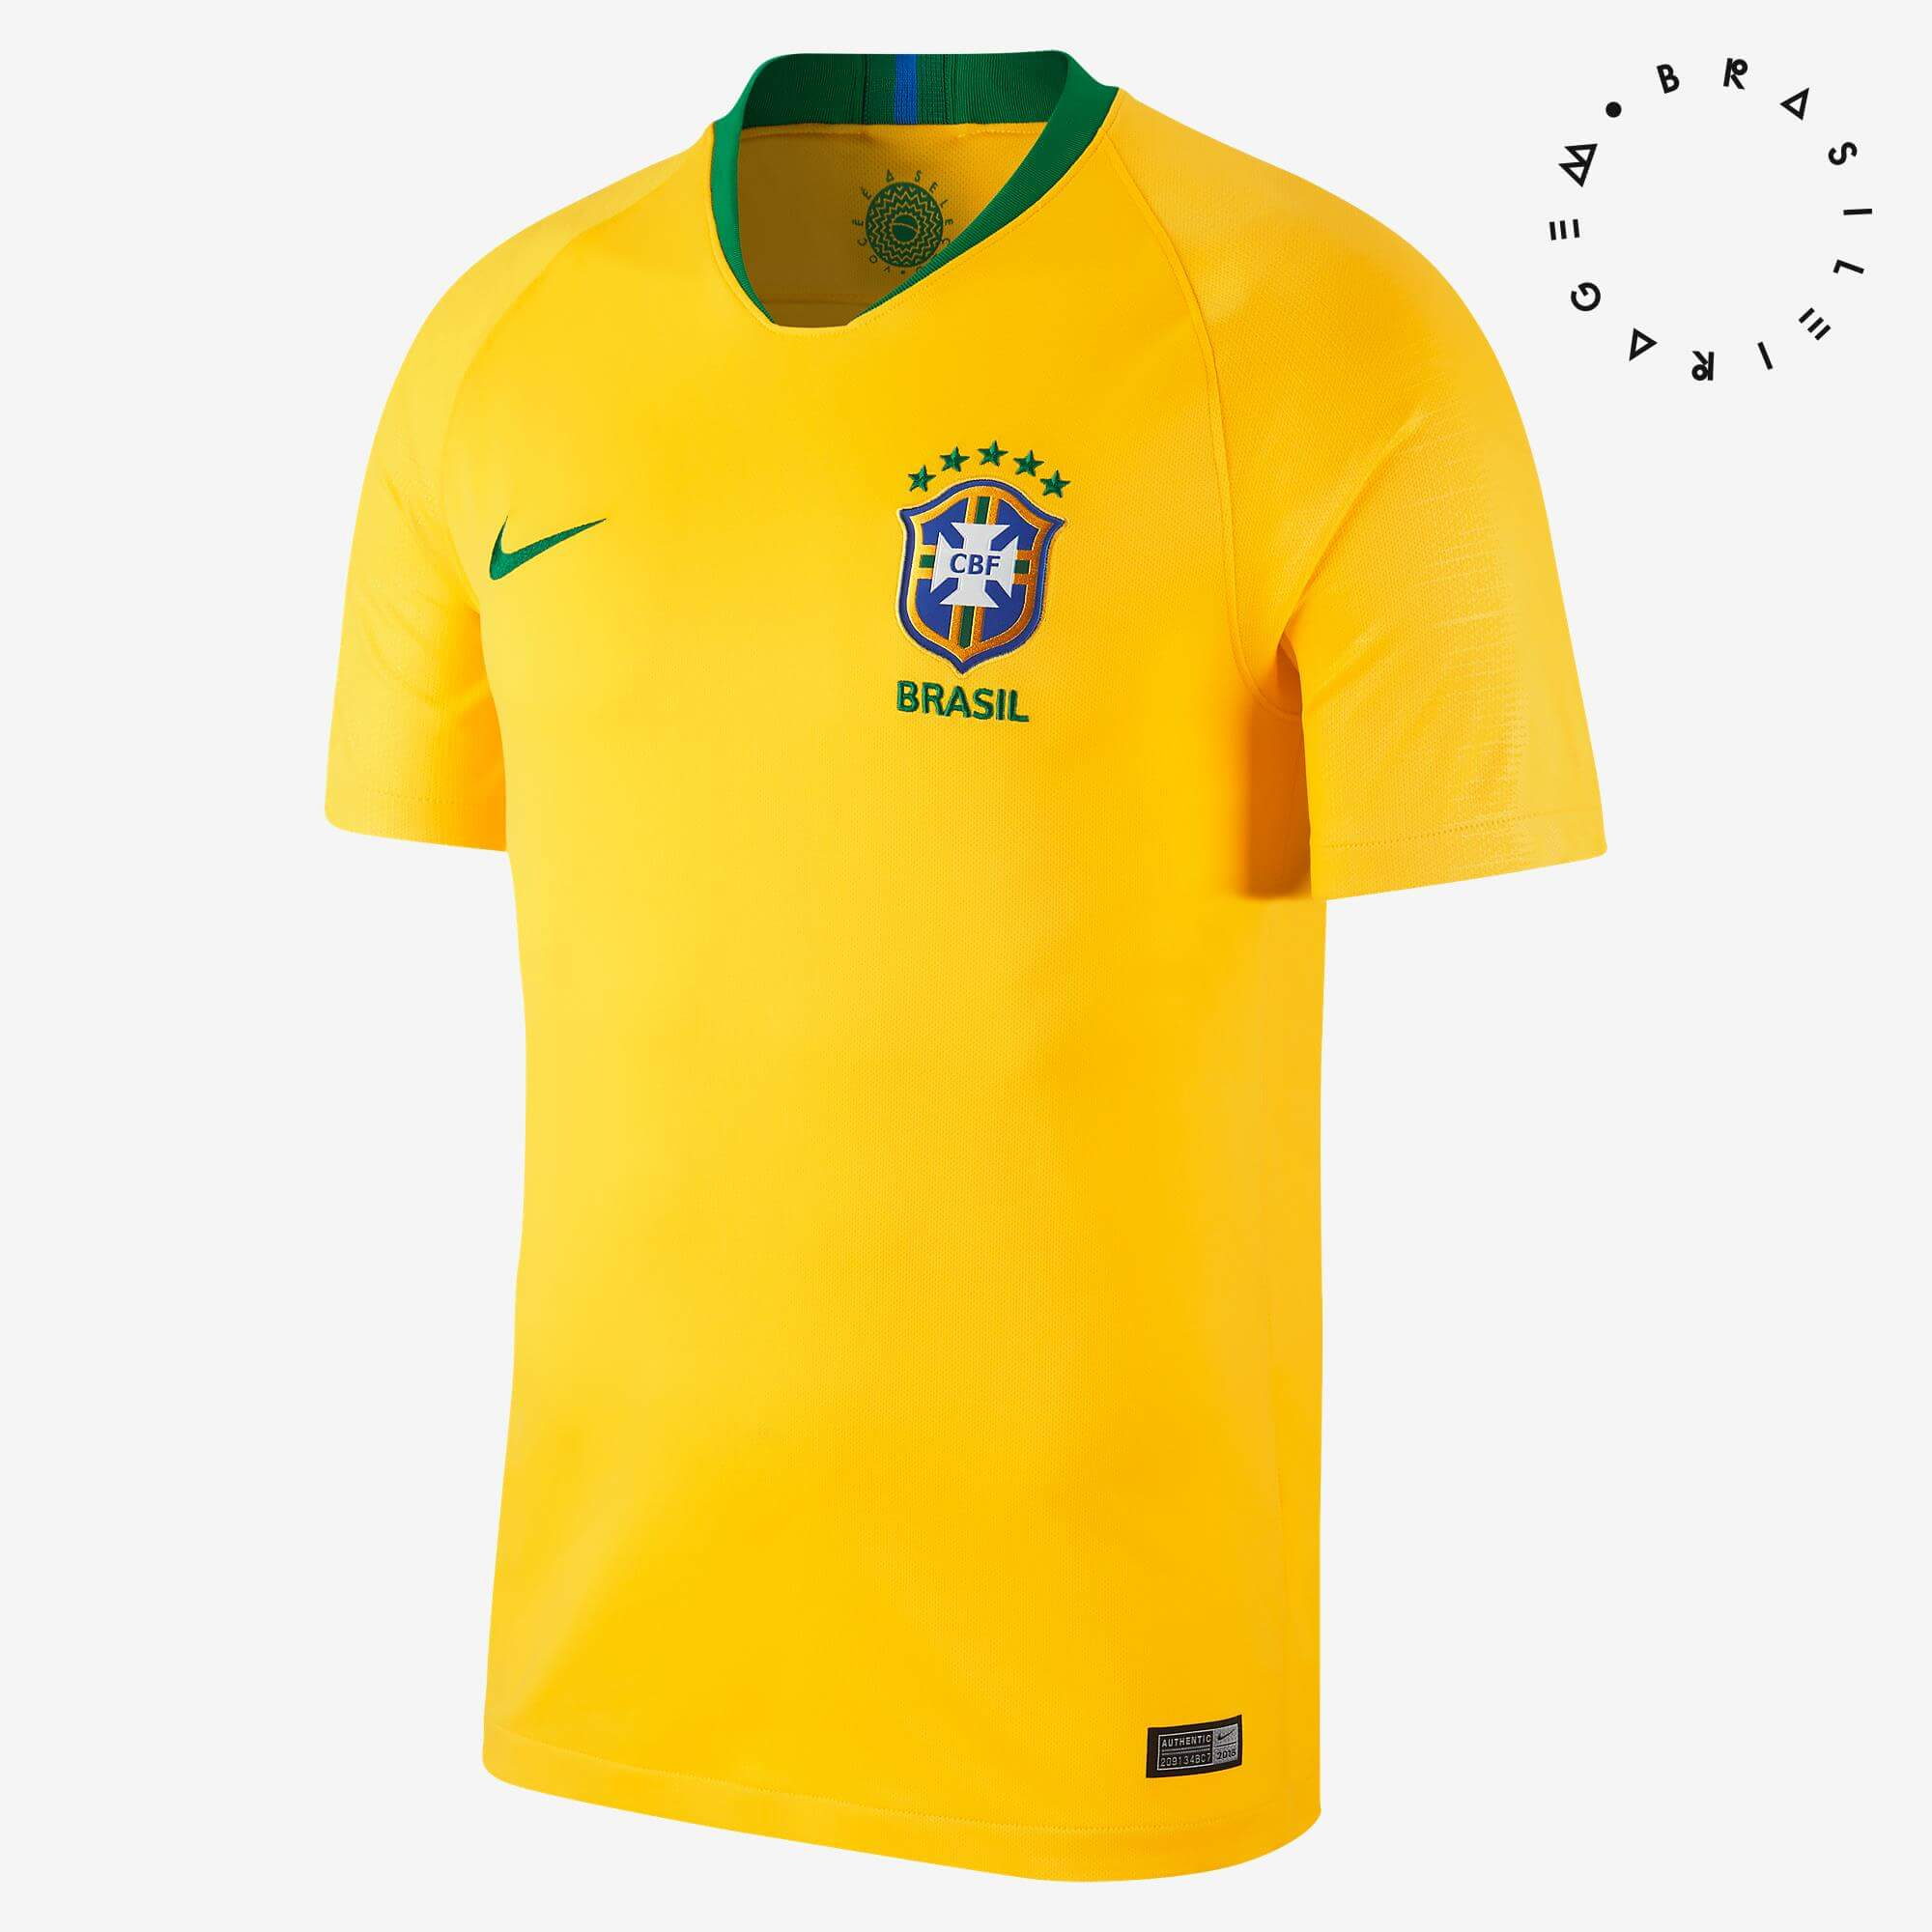 Camisa Seleção Brasileira Nike Cbf Brt Stad Jsy